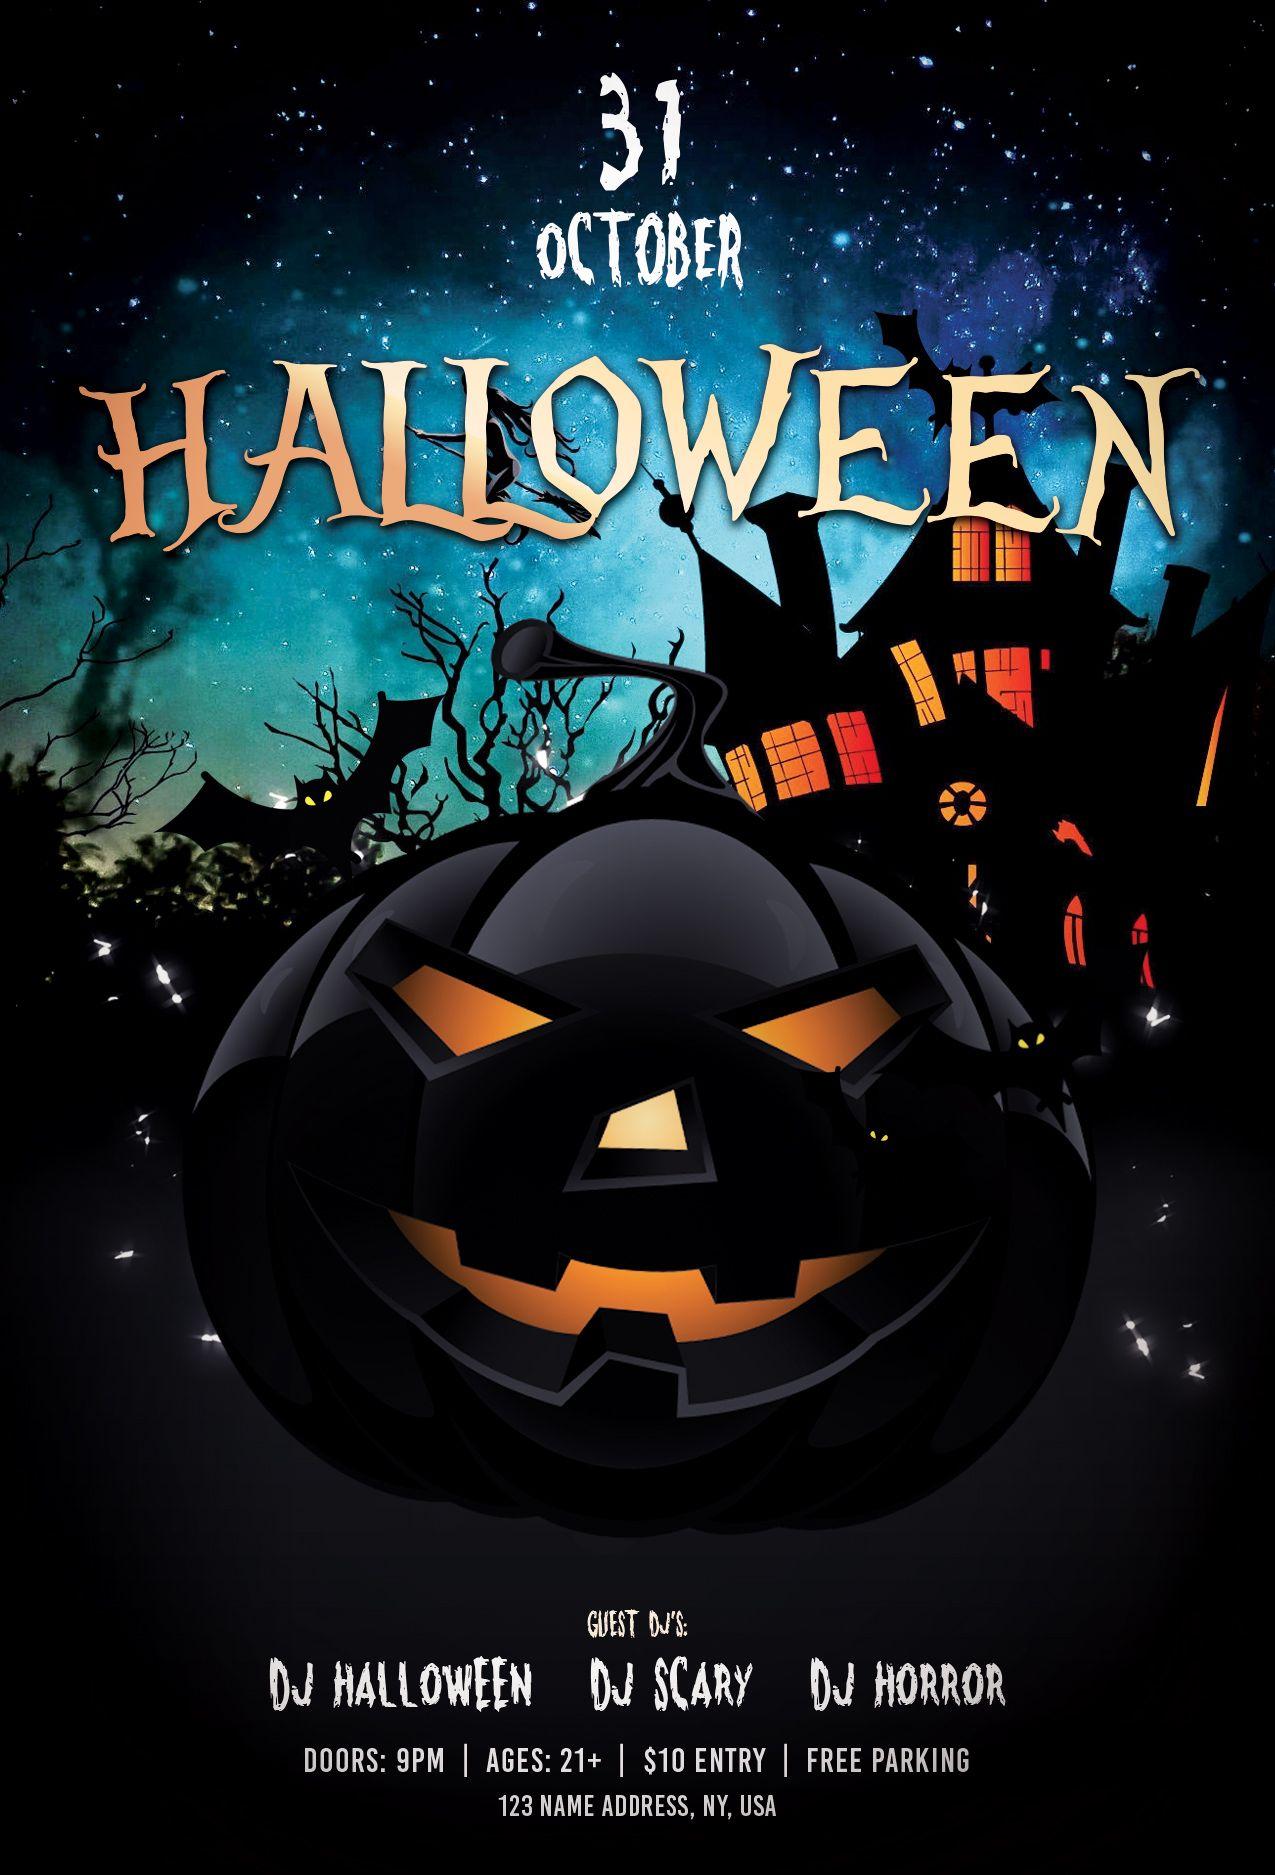 Halloween Party Free PSD Flyer Template Halloween